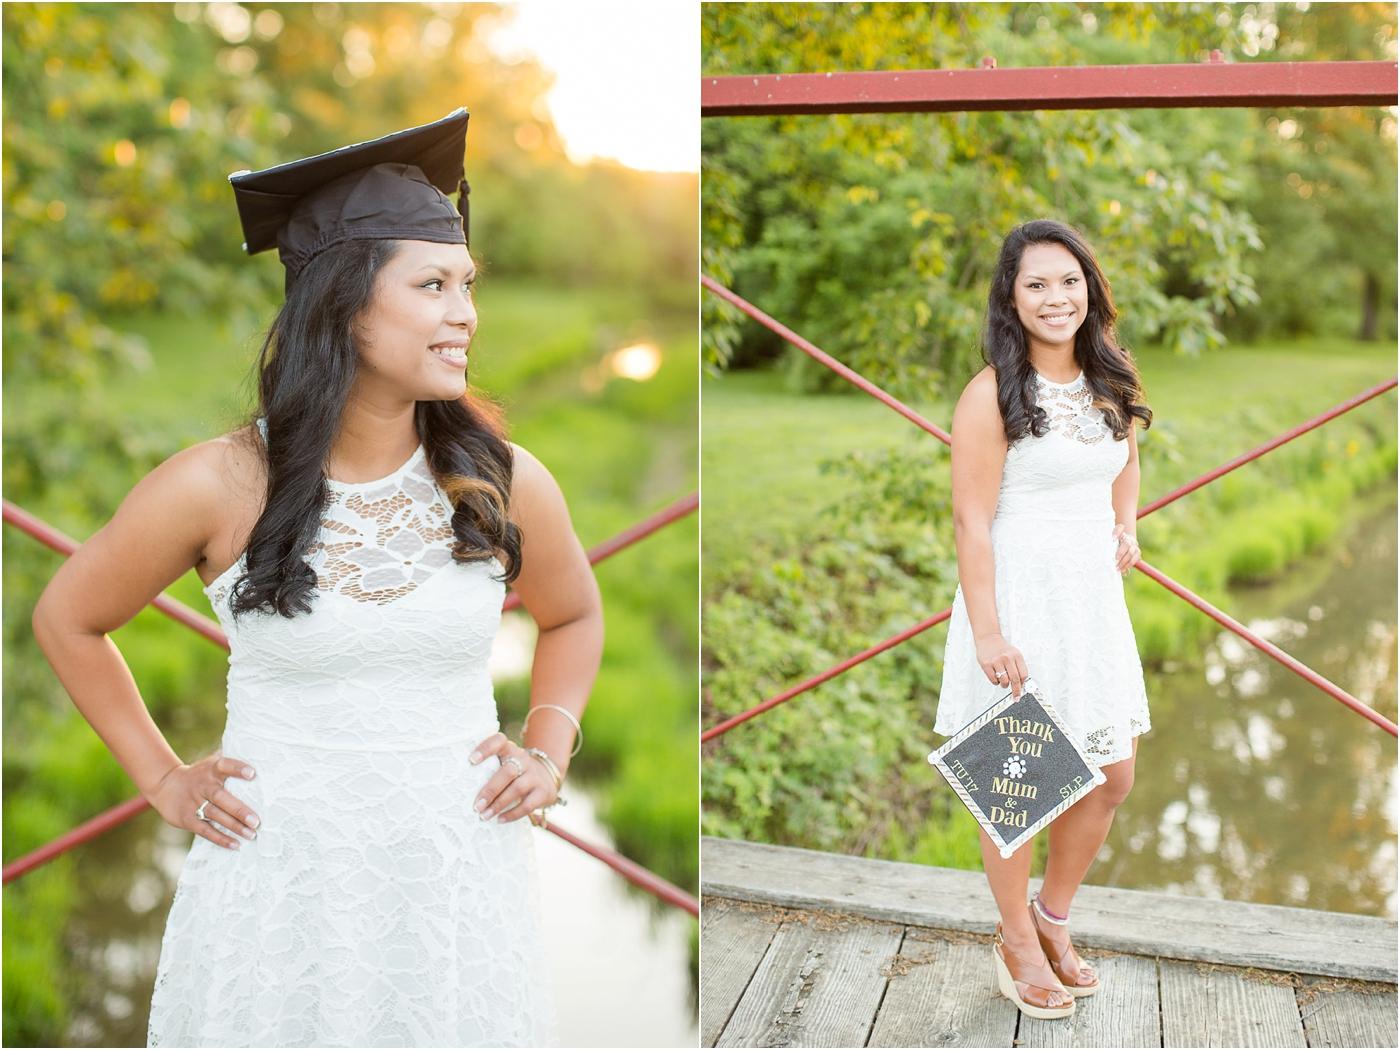 Jenna-Senior-2017-311-graduation-photos.jpg